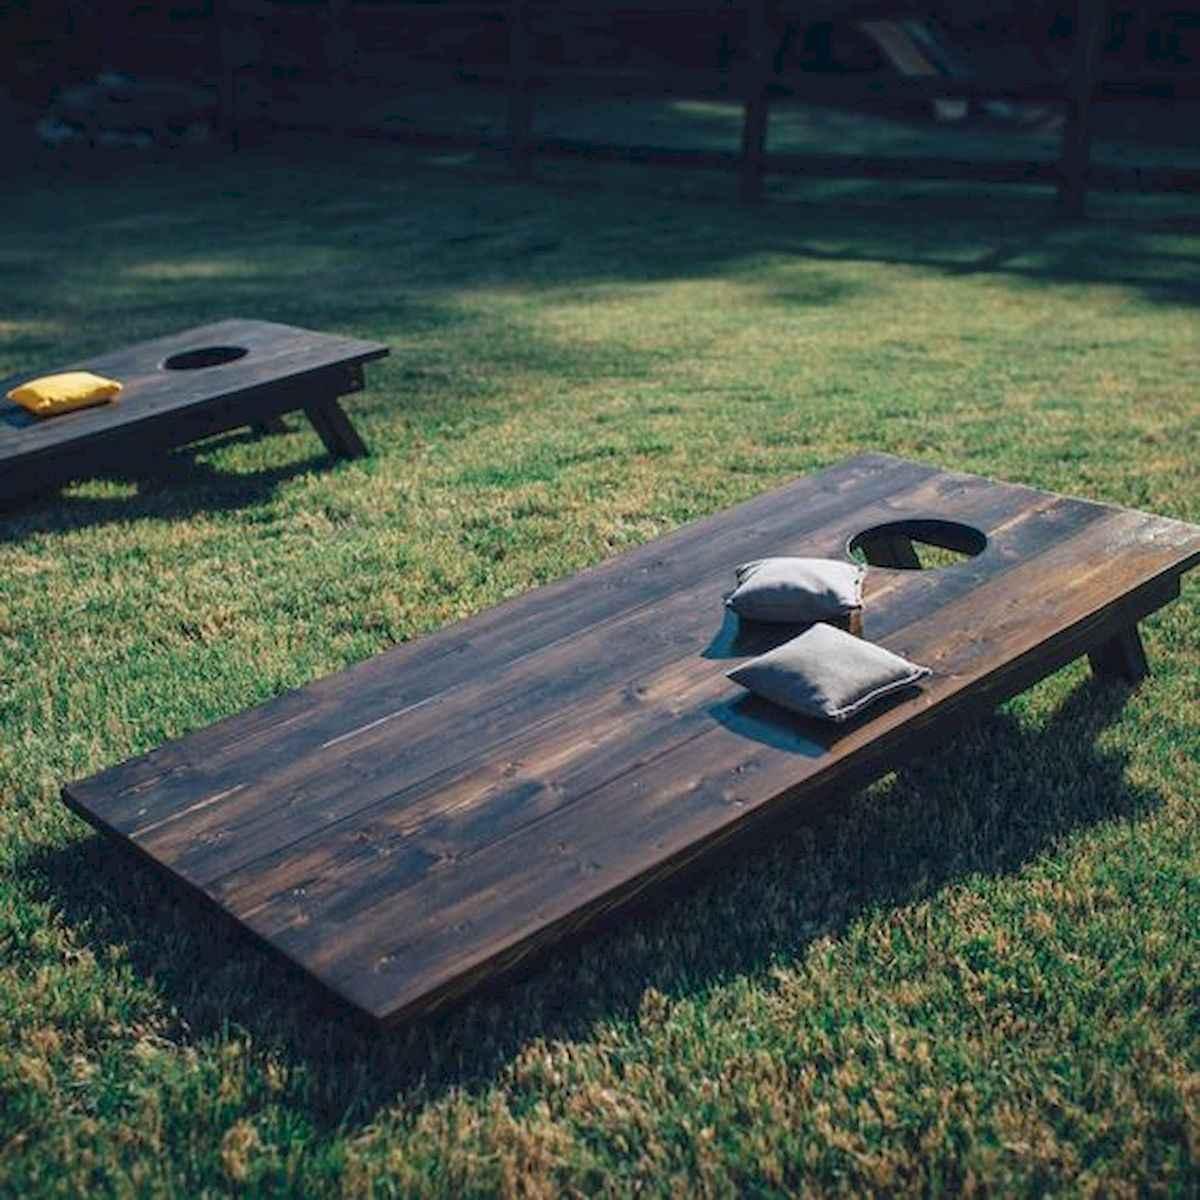 60 Amazing DIY Projects Otdoors Furniture Design Ideas (32)